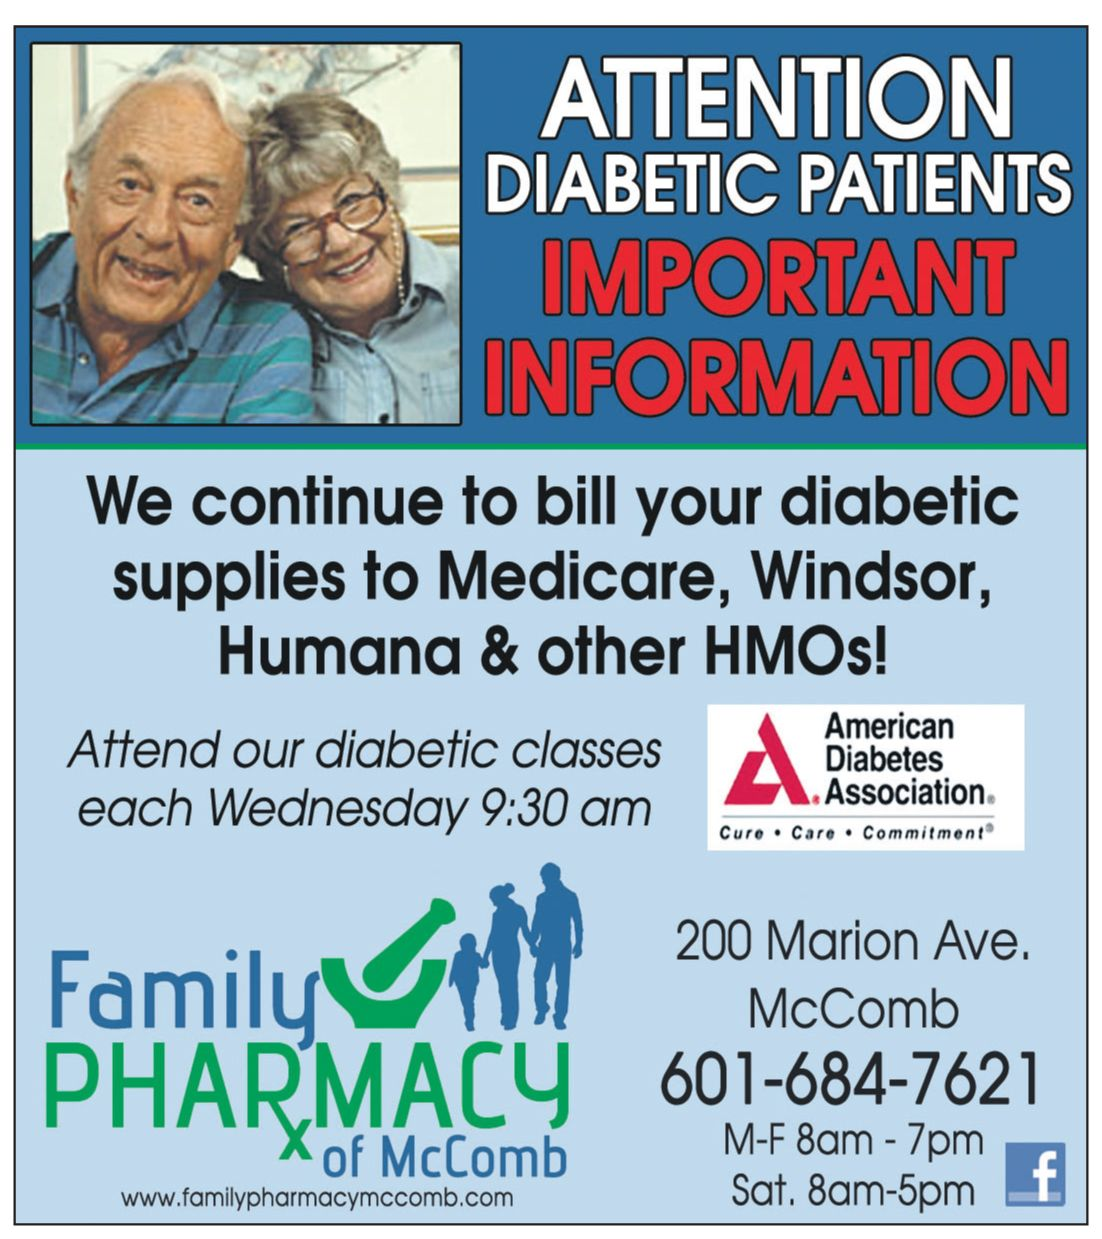 Diabetic Supplies Diabetes Diabetic Diabetes education